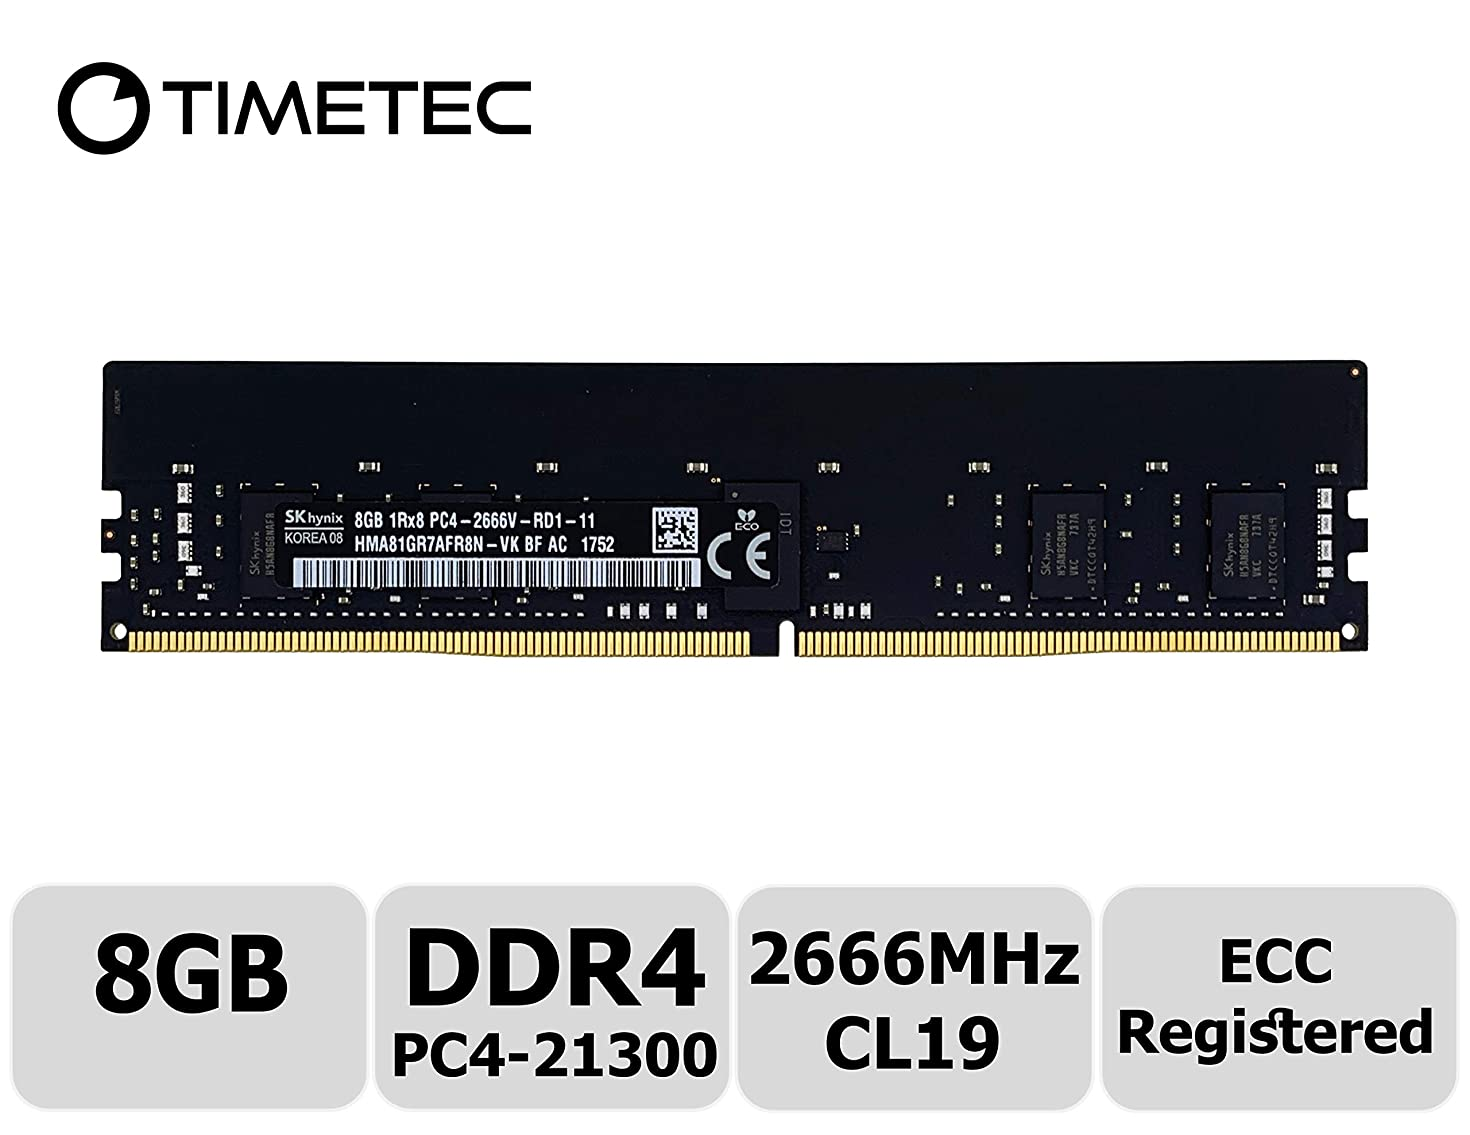 Timetec Hynix 8GB DDR4 2666MHz PC4-21300 Registered ECC 1.2V CL19 1Rx8 Single Rank 288 Pin RDIMM Server Memory RAM Module Upgrade (8GB)